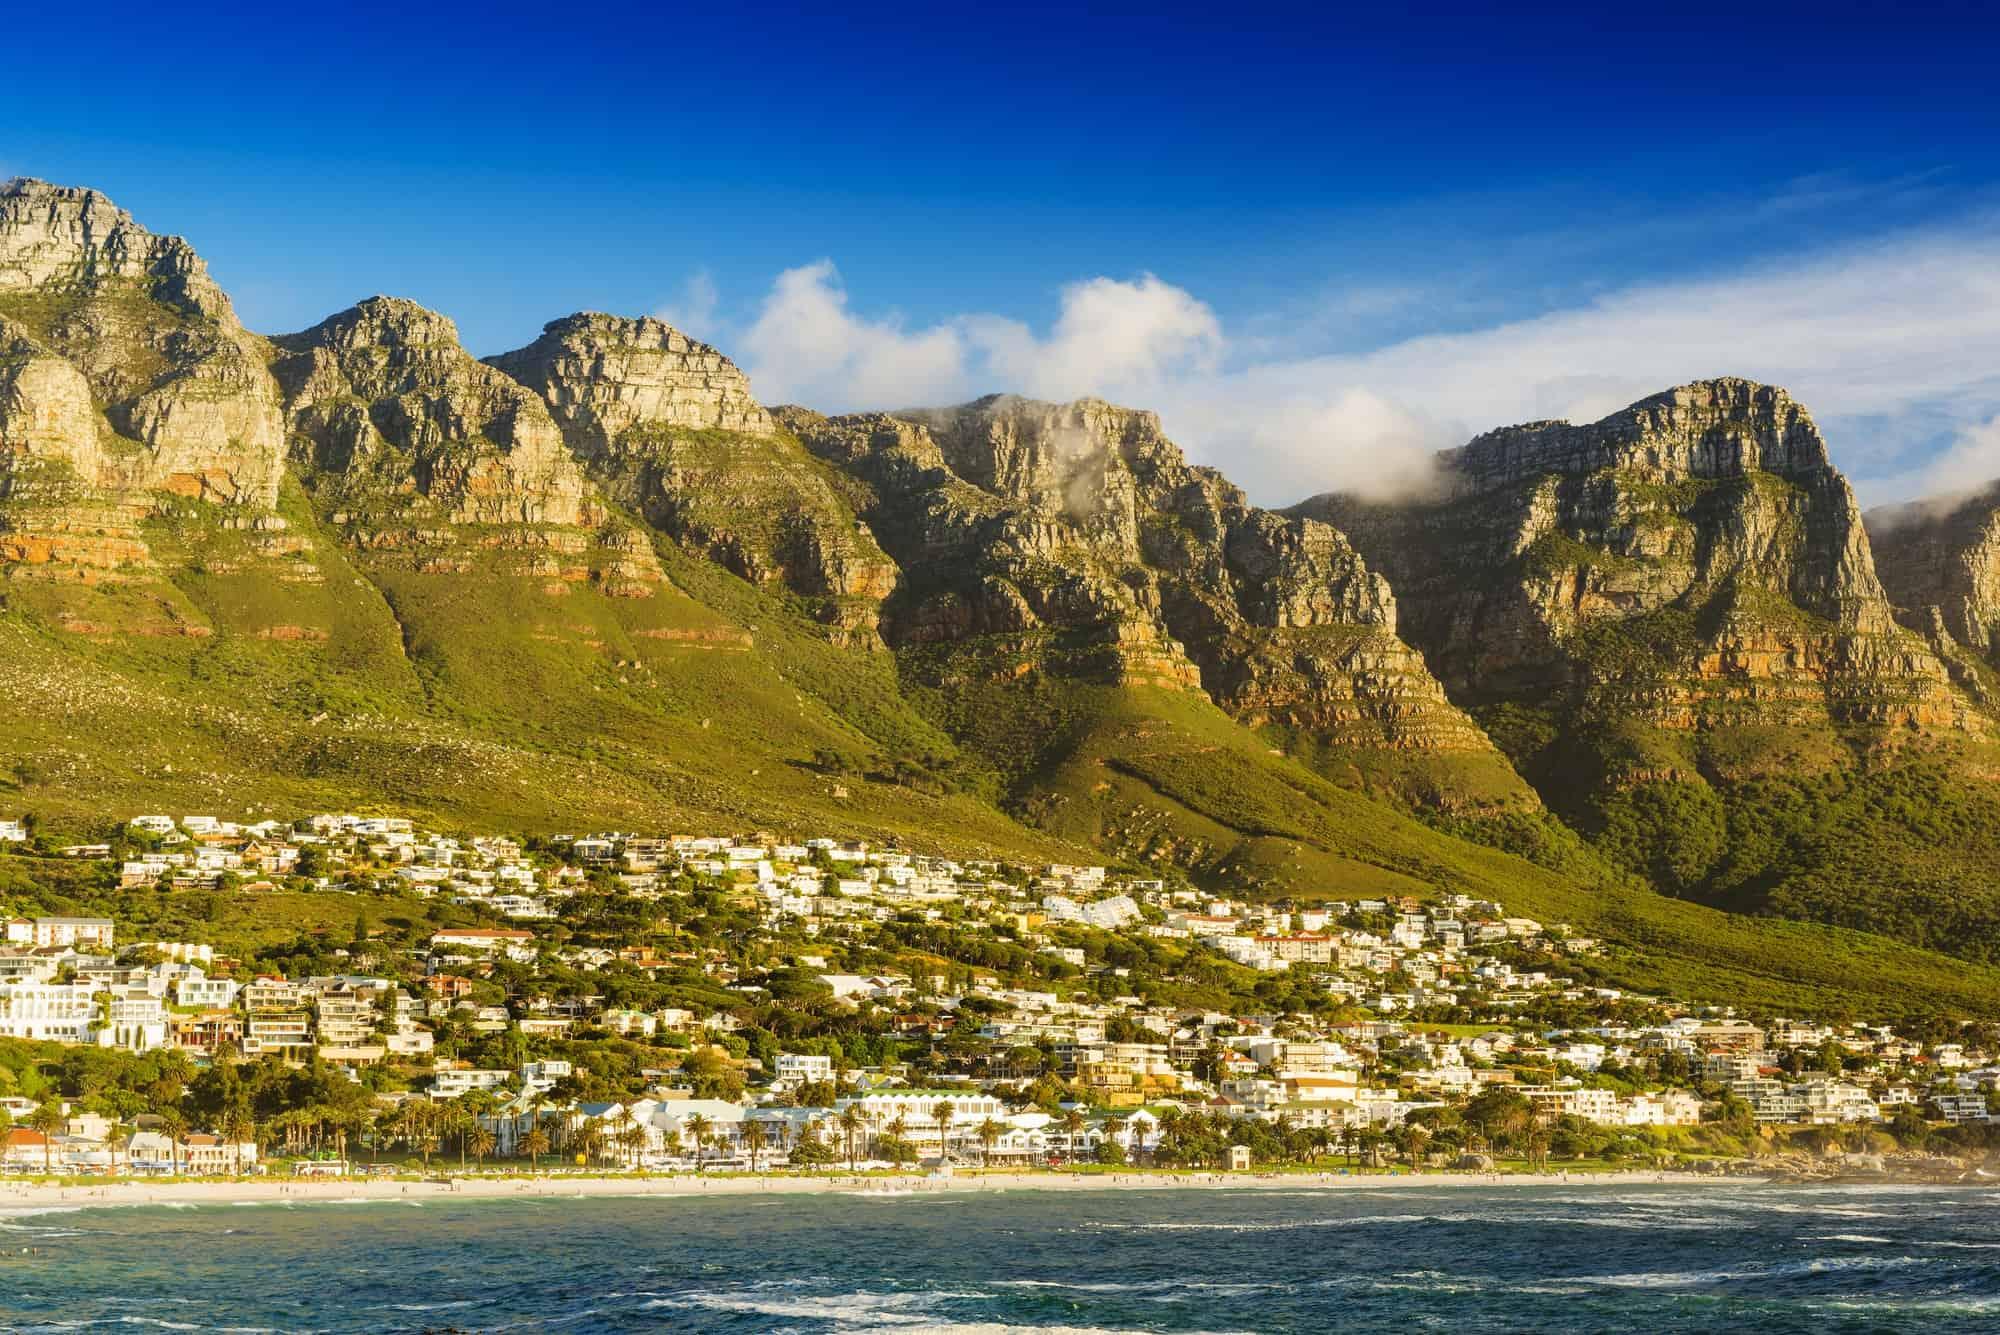 Twelve Apostles in South Africa